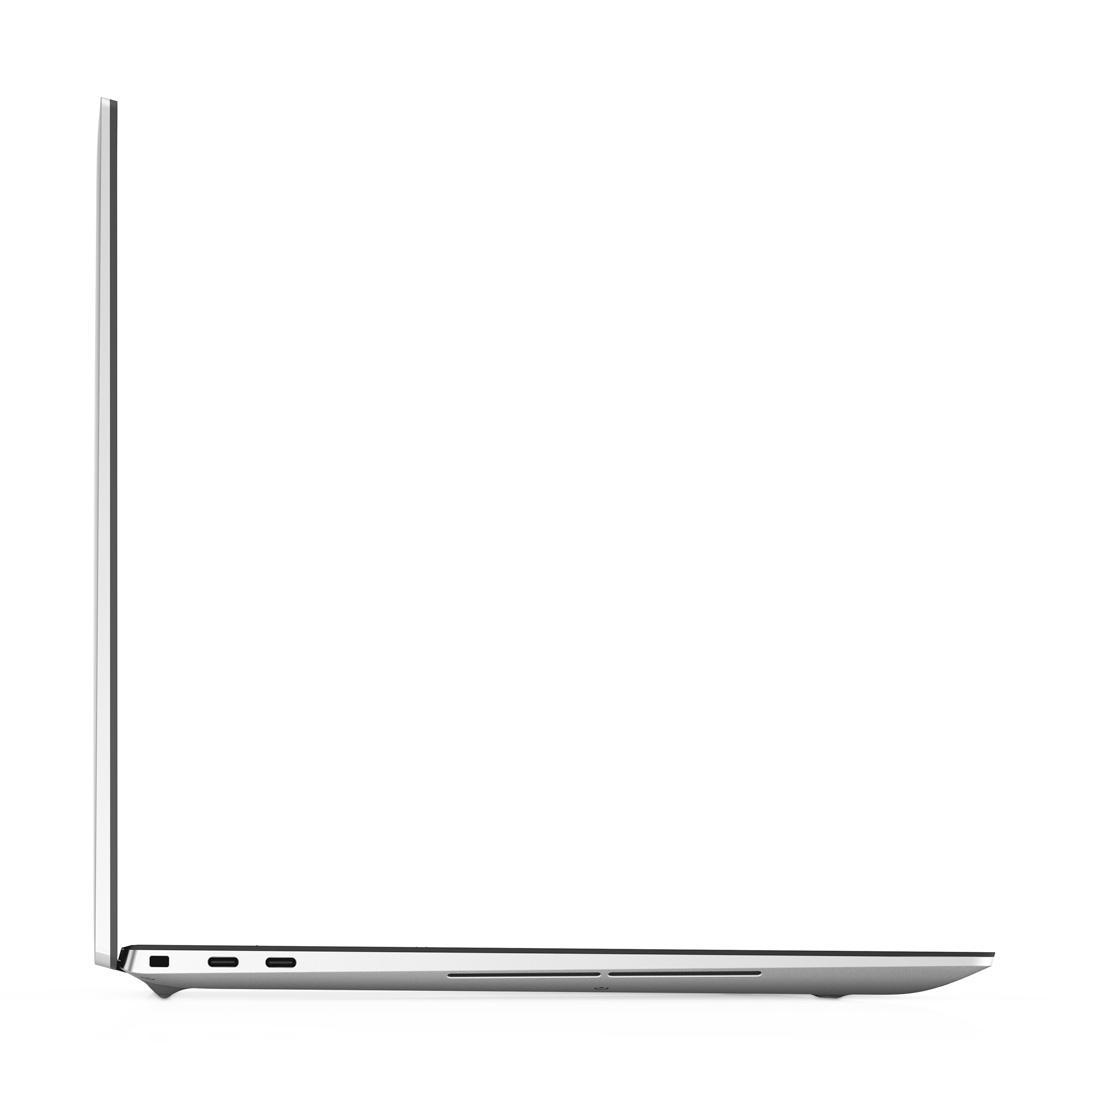 Ordinateur portable Dell XPS 17 9700 (F2KGC) - 4K tactile, Core i7, RTX 2060 Max-Q, 16 Go, SSD 1 To - photo 8